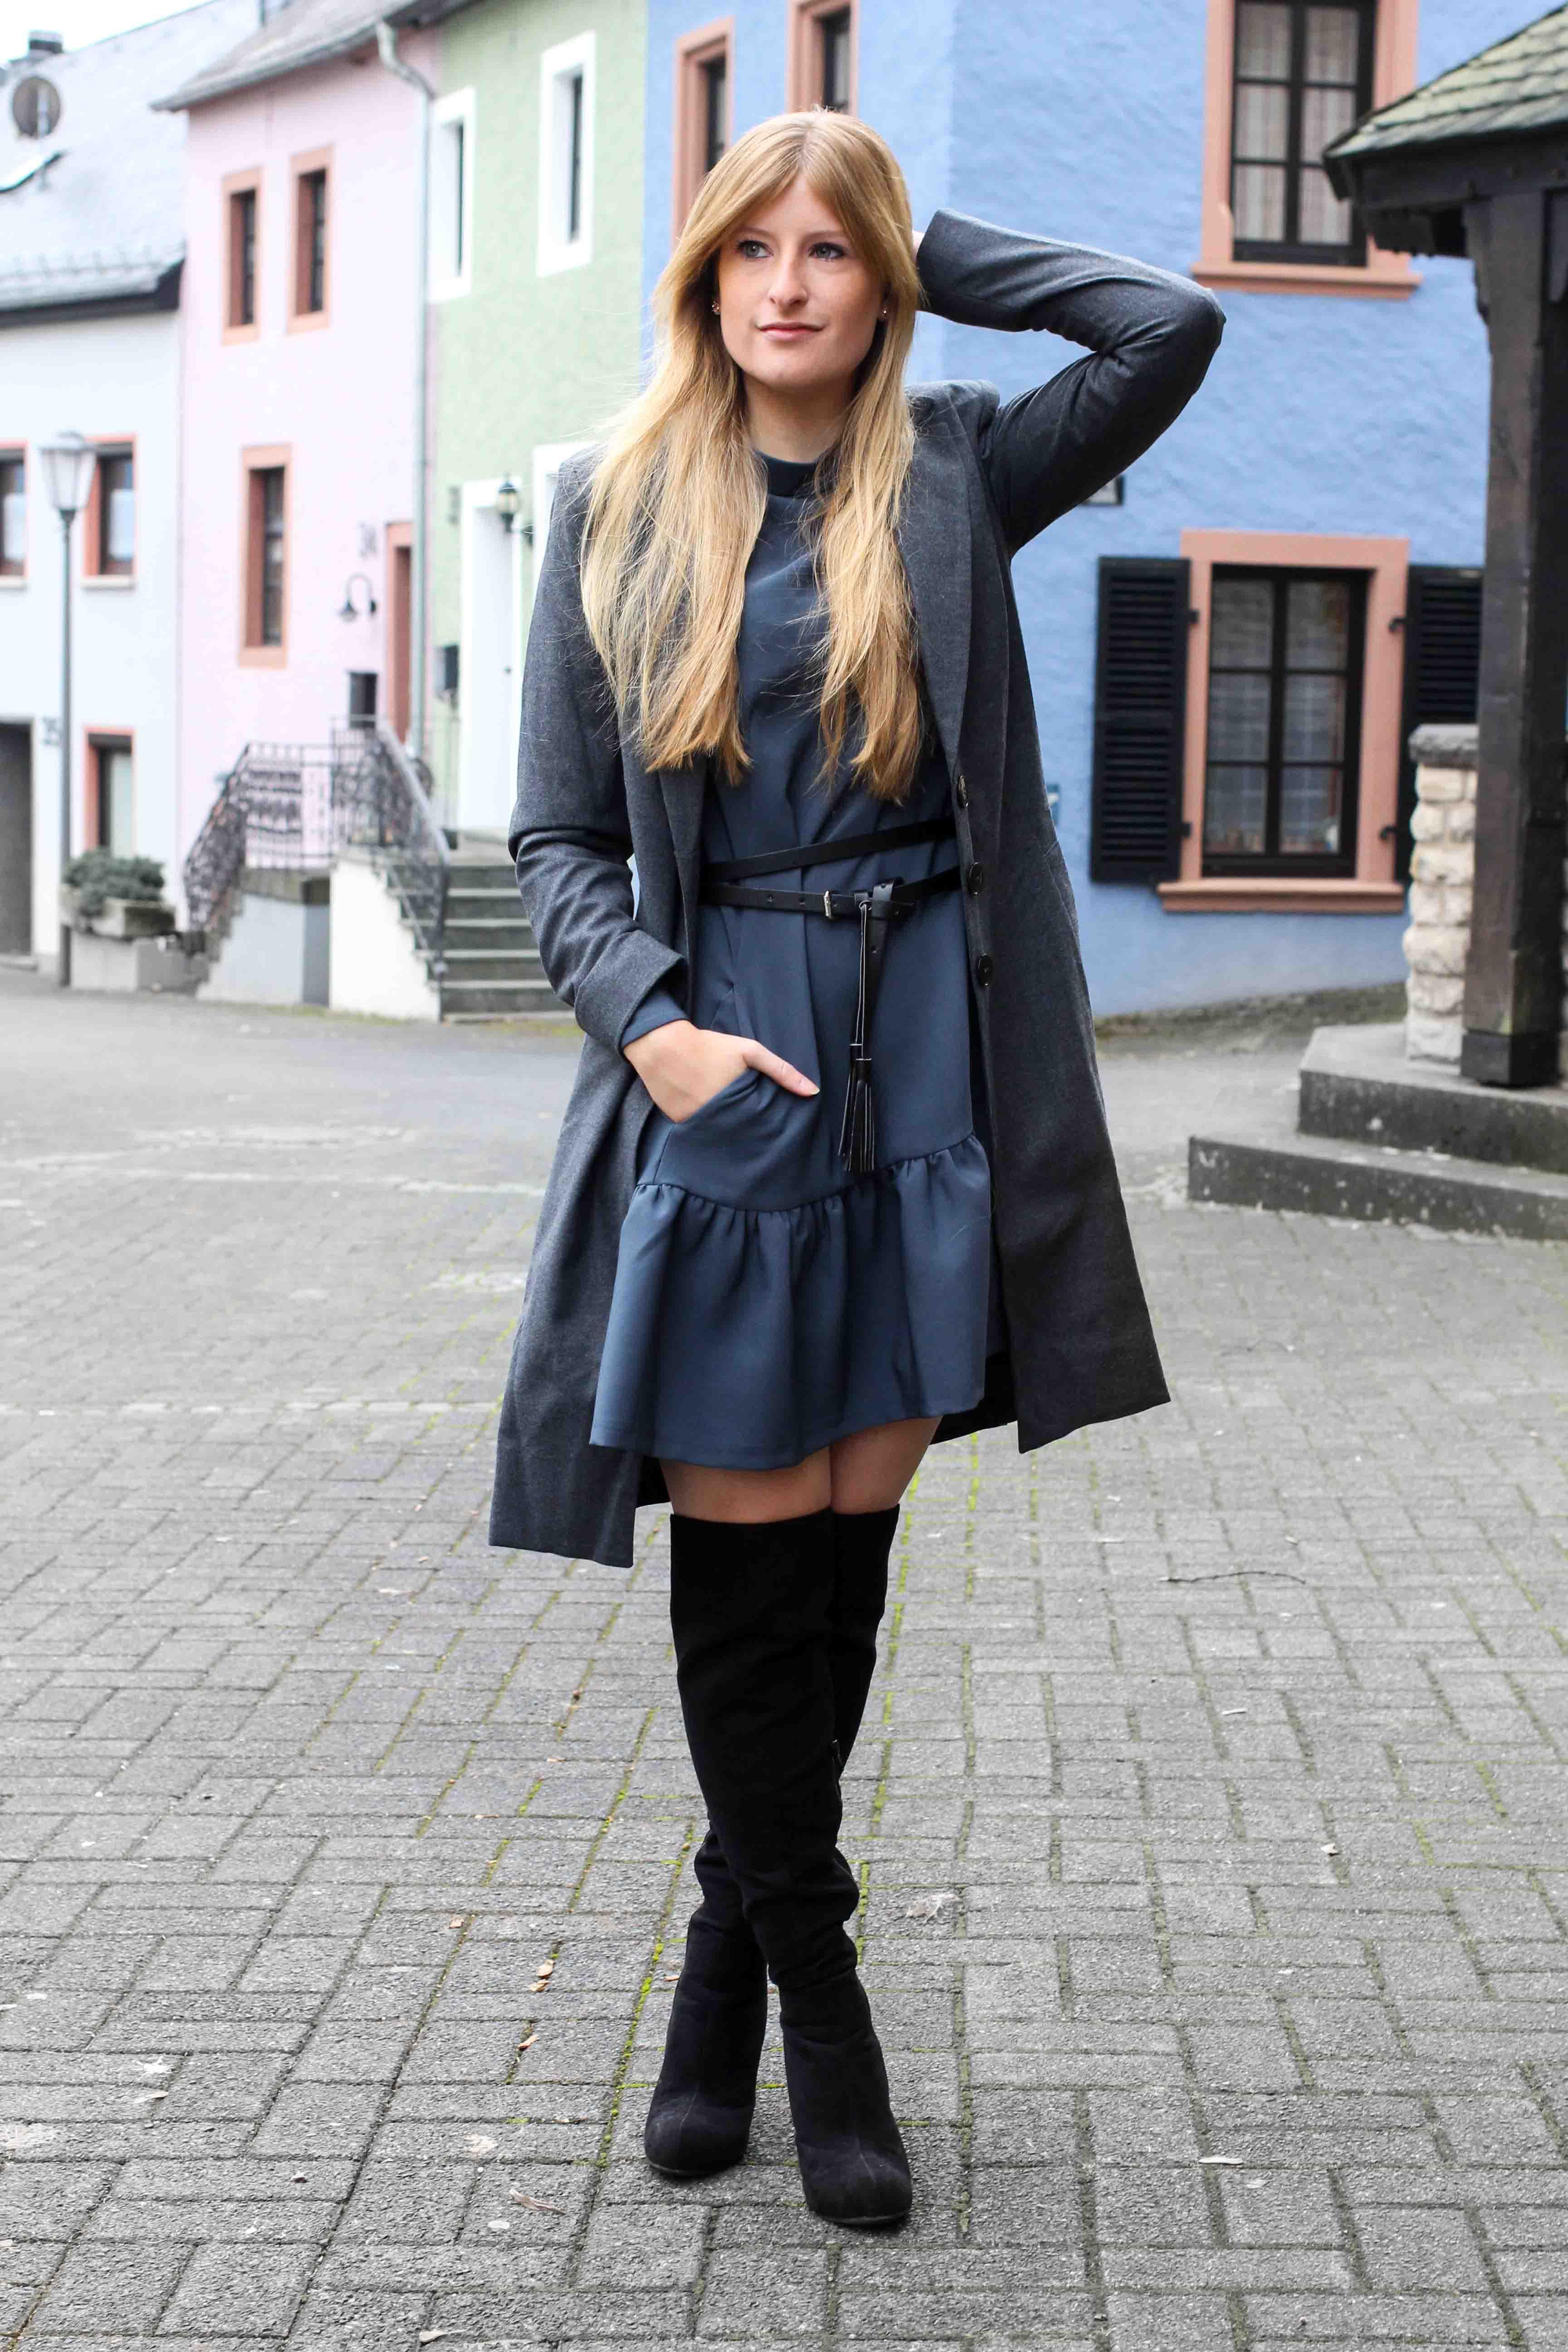 Blaues Winterkleid Closet London schwarze Overknees grauer Mantel Winter Outfit Modeblog 7